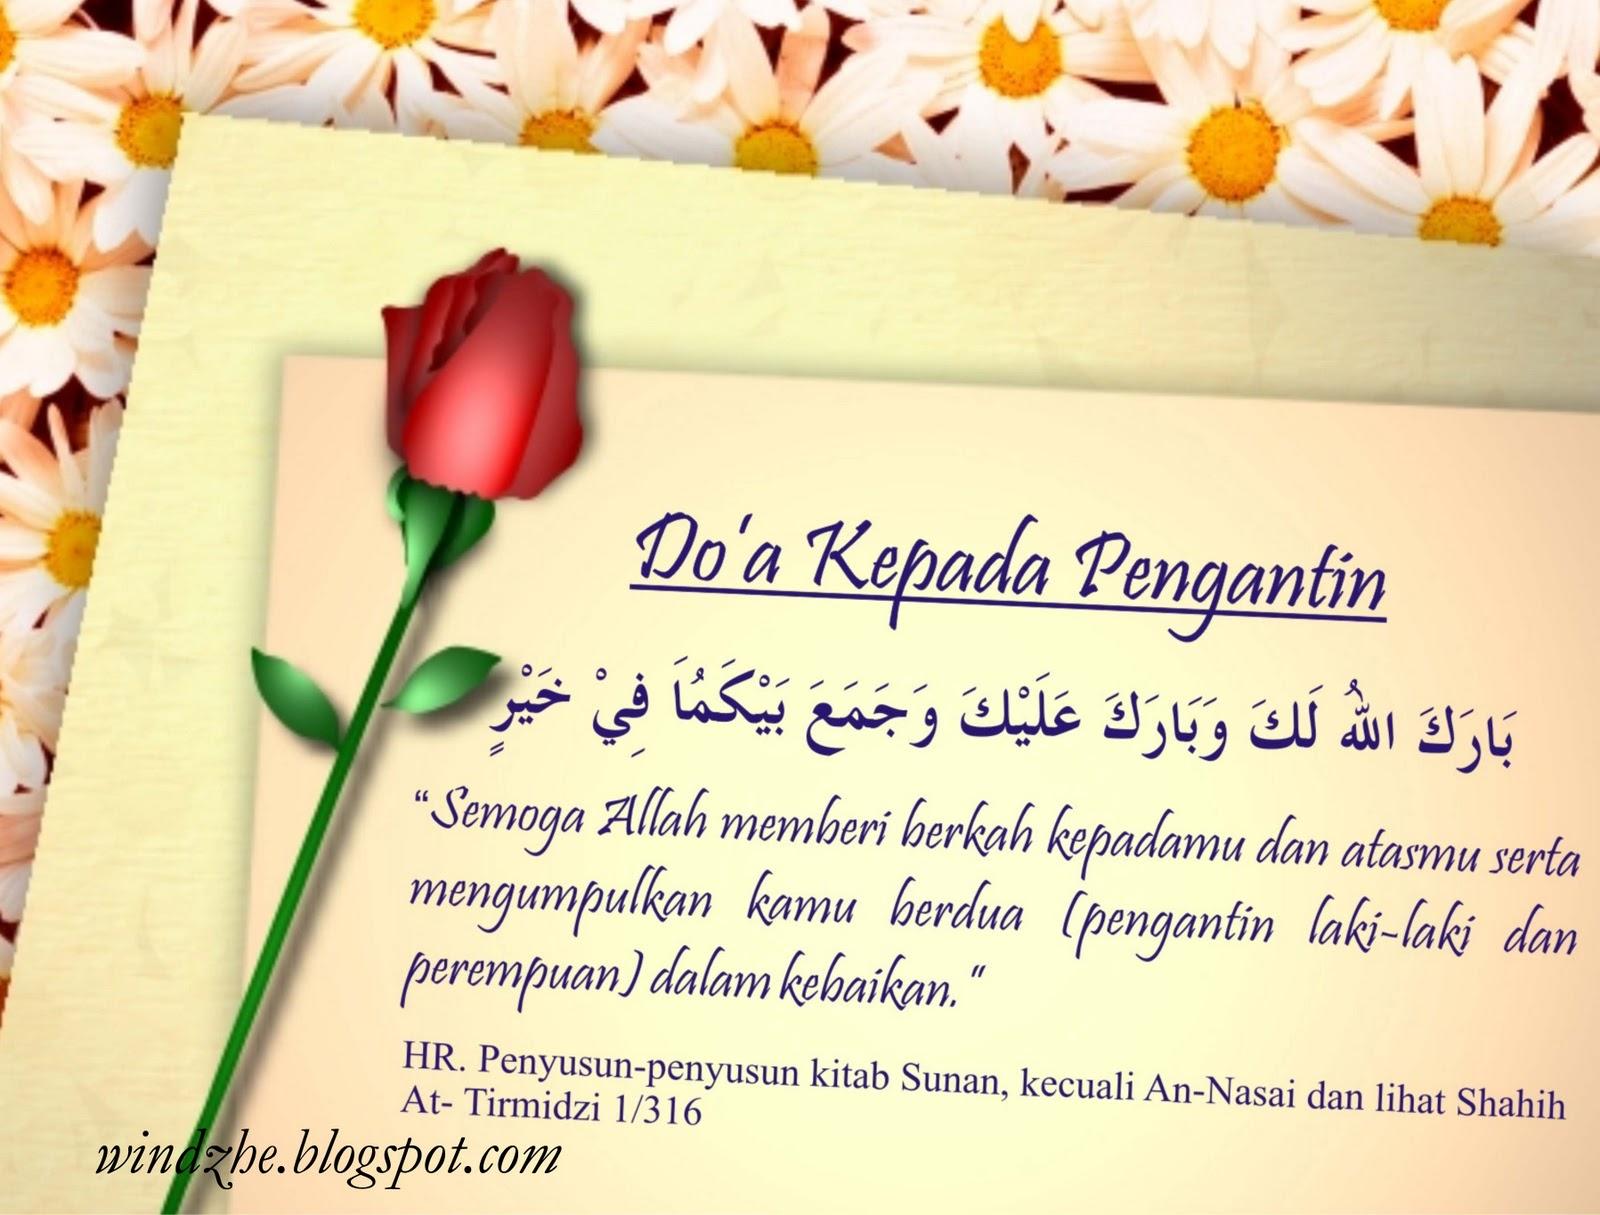 Pernikahan adalah upacara pengikatan janji nikah yang dirayakan atau